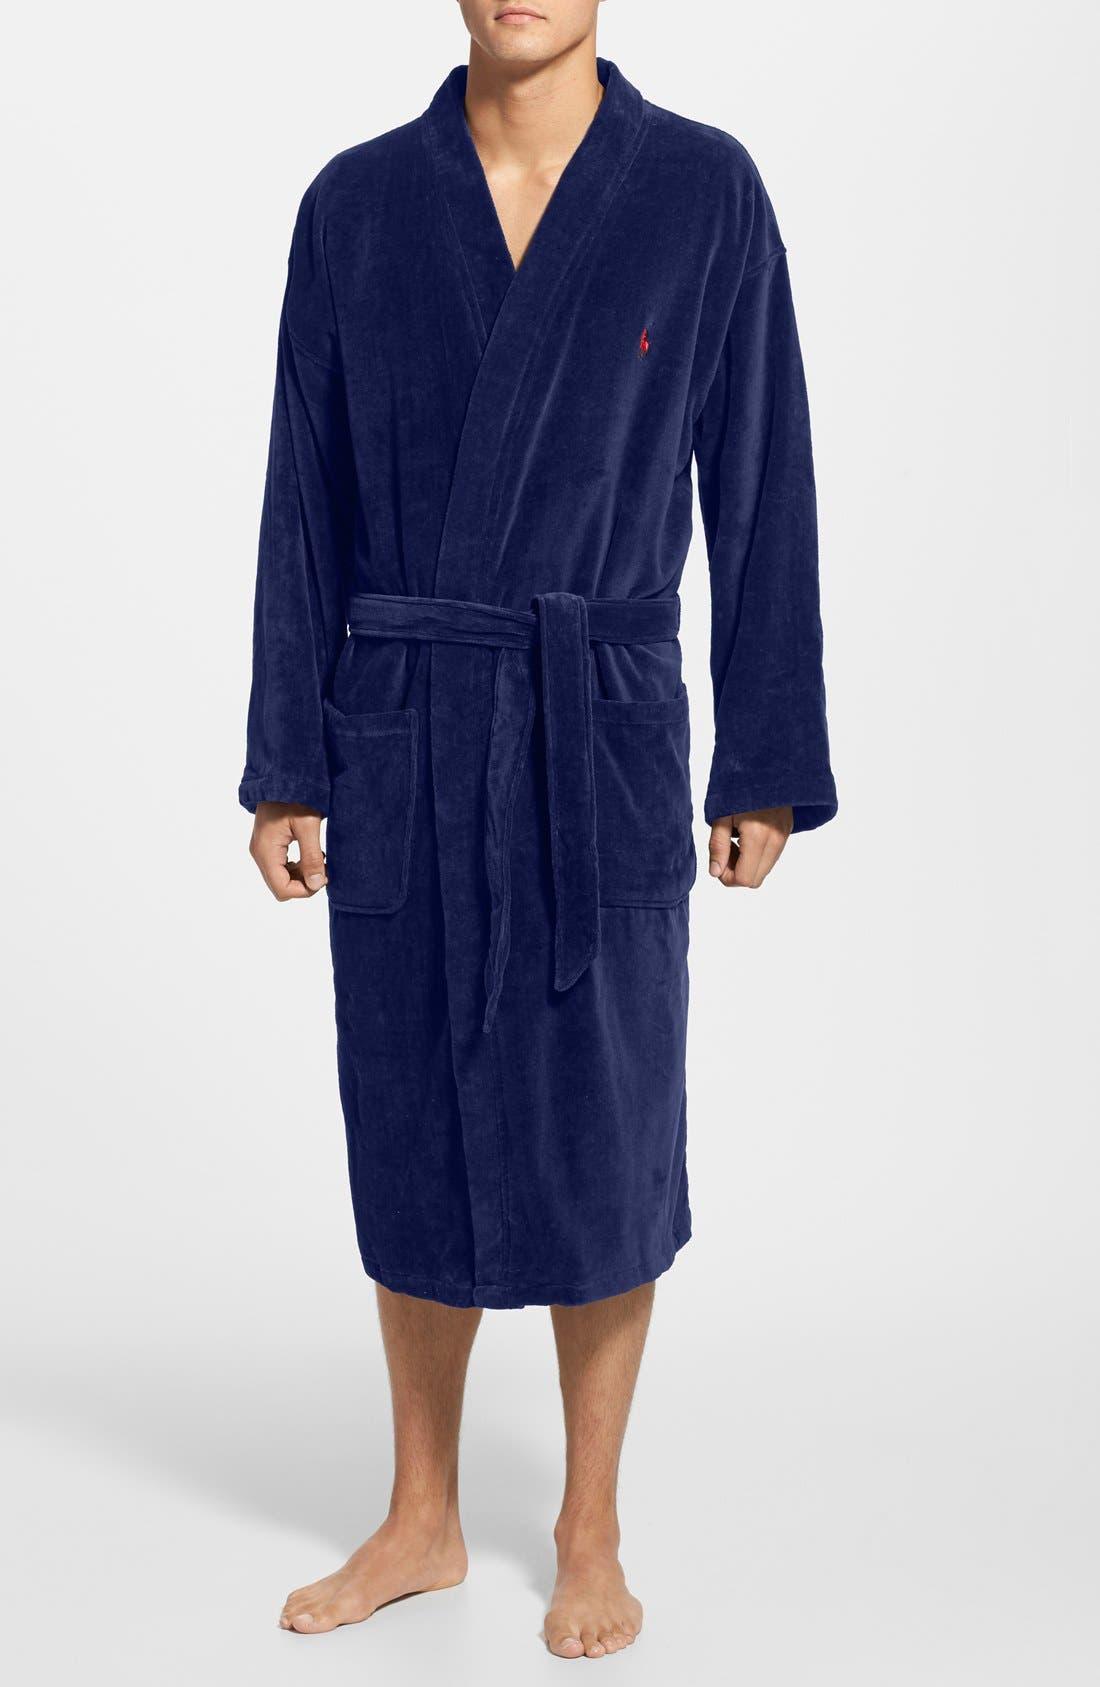 Alternate Image 1 Selected - Polo Ralph Lauren Cotton Fleece Robe